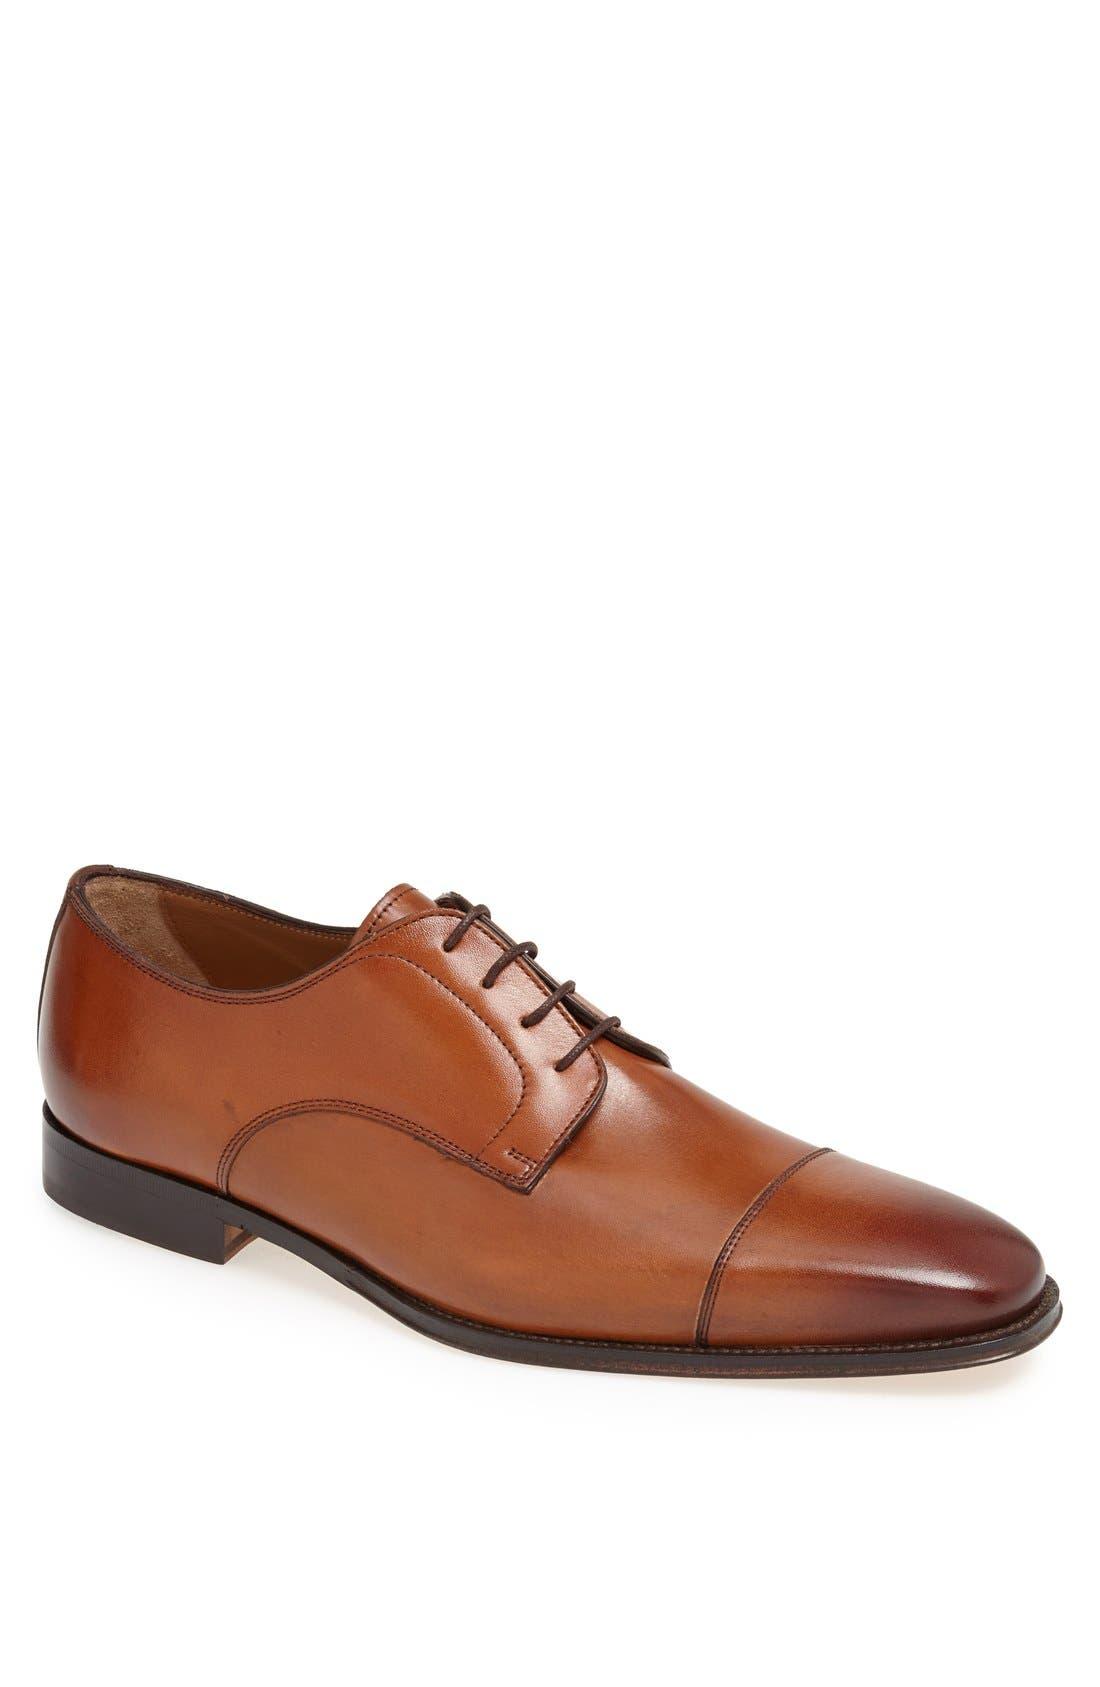 Classico Cap Toe Oxford,                         Main,                         color, Cognac